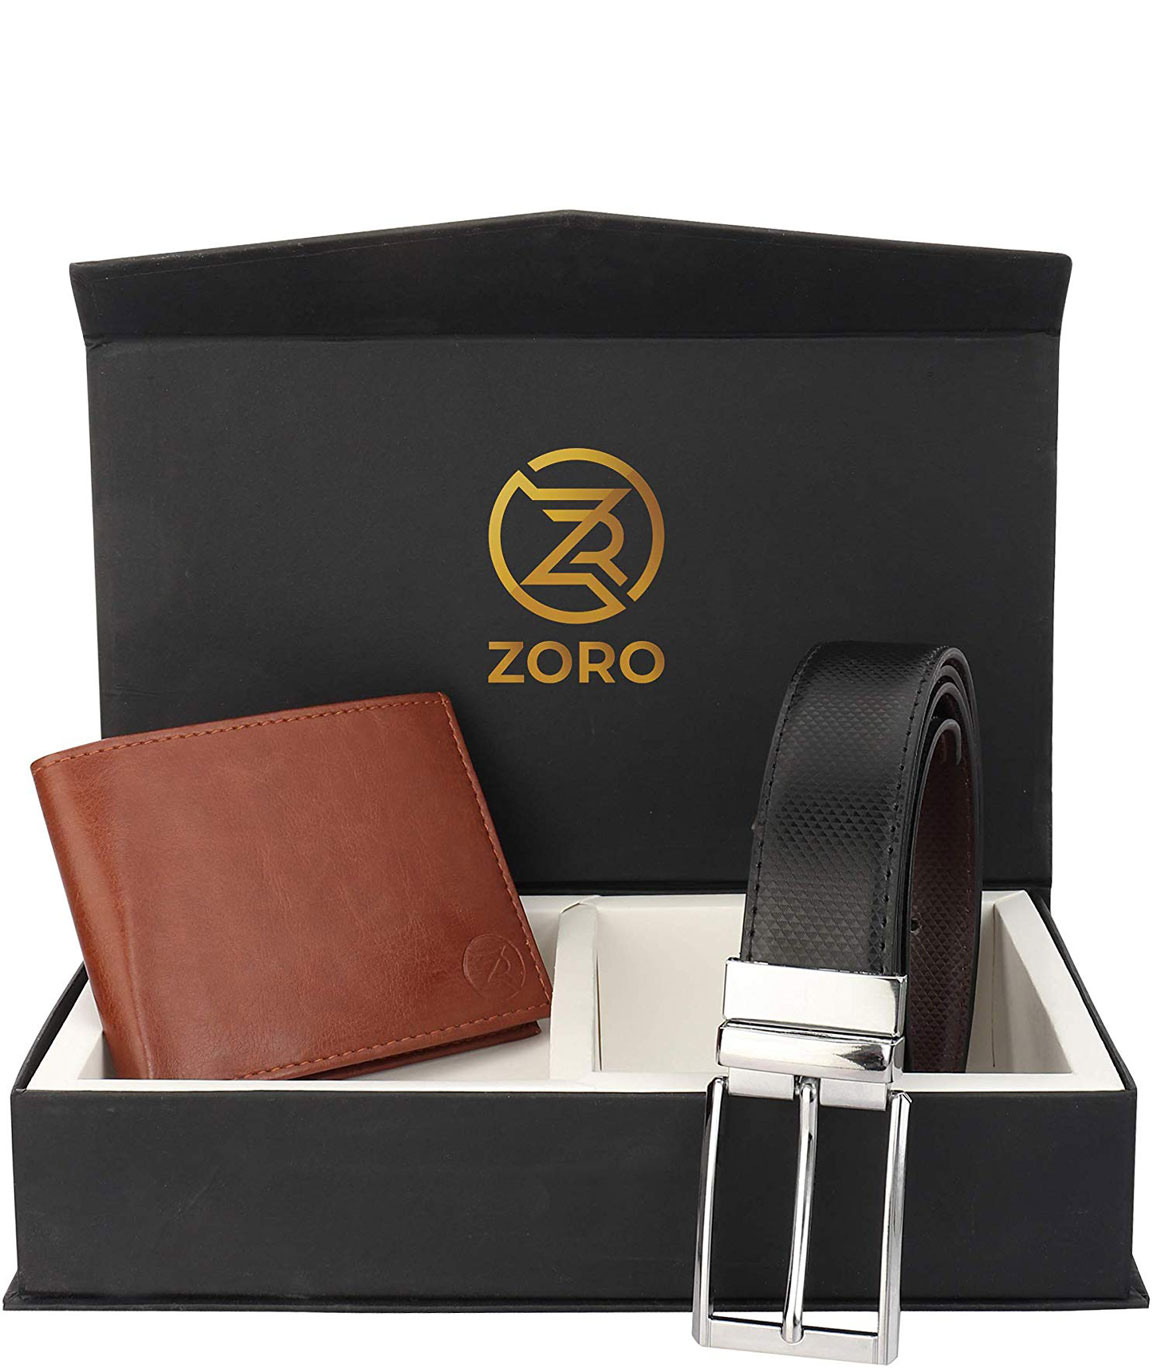 ZORO Reversible PU belt and wallet combo, formal black and brown reversible belt, gift for mens, gents belt, mens wallet ZR-CR04T-101T